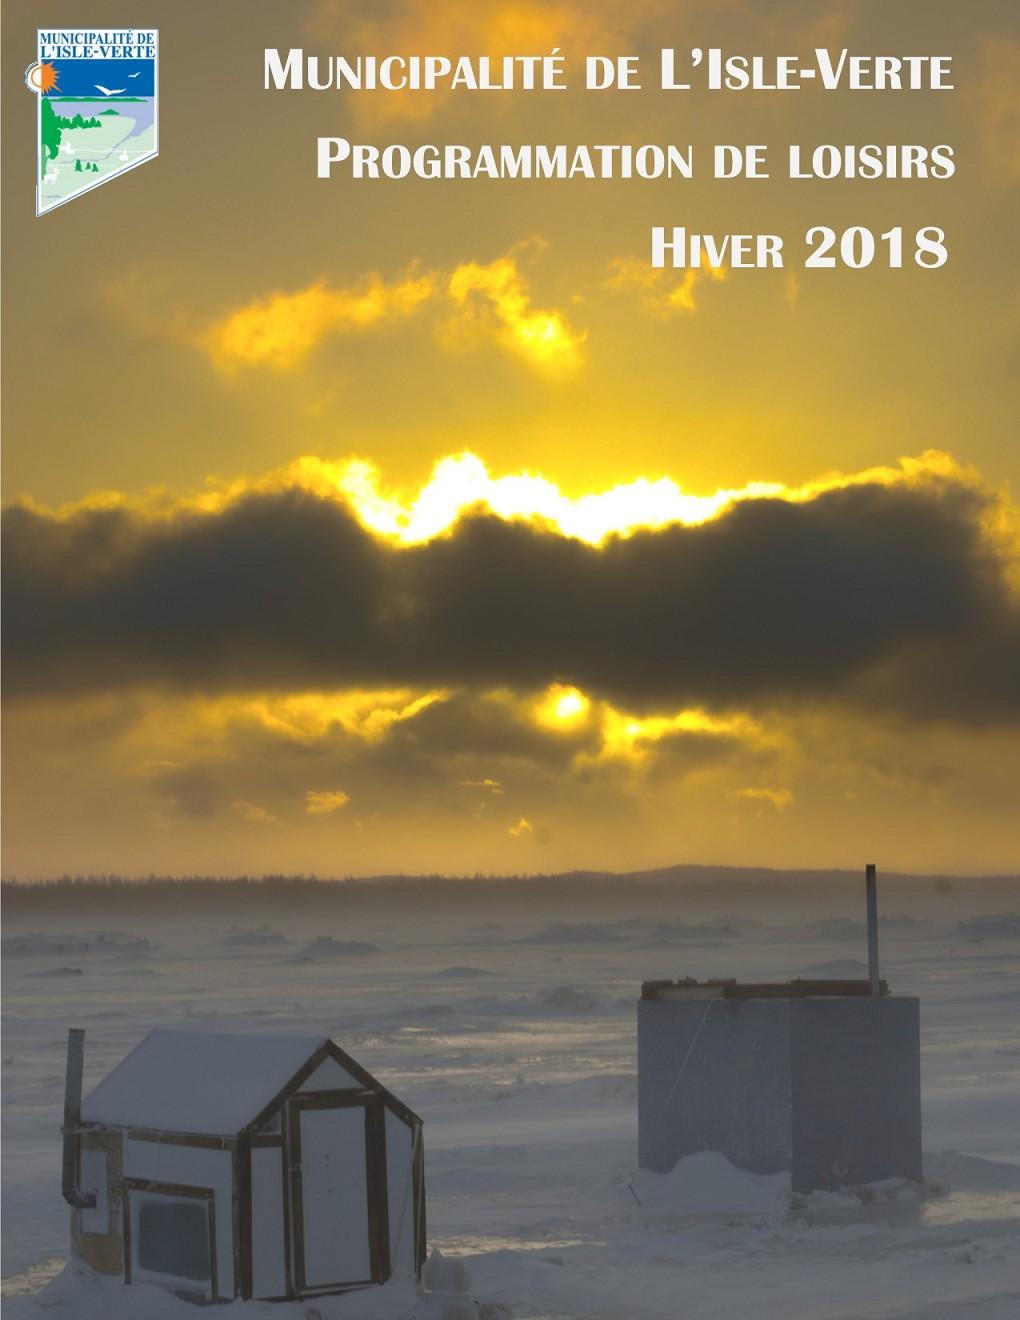 prog hiver 2018 cover